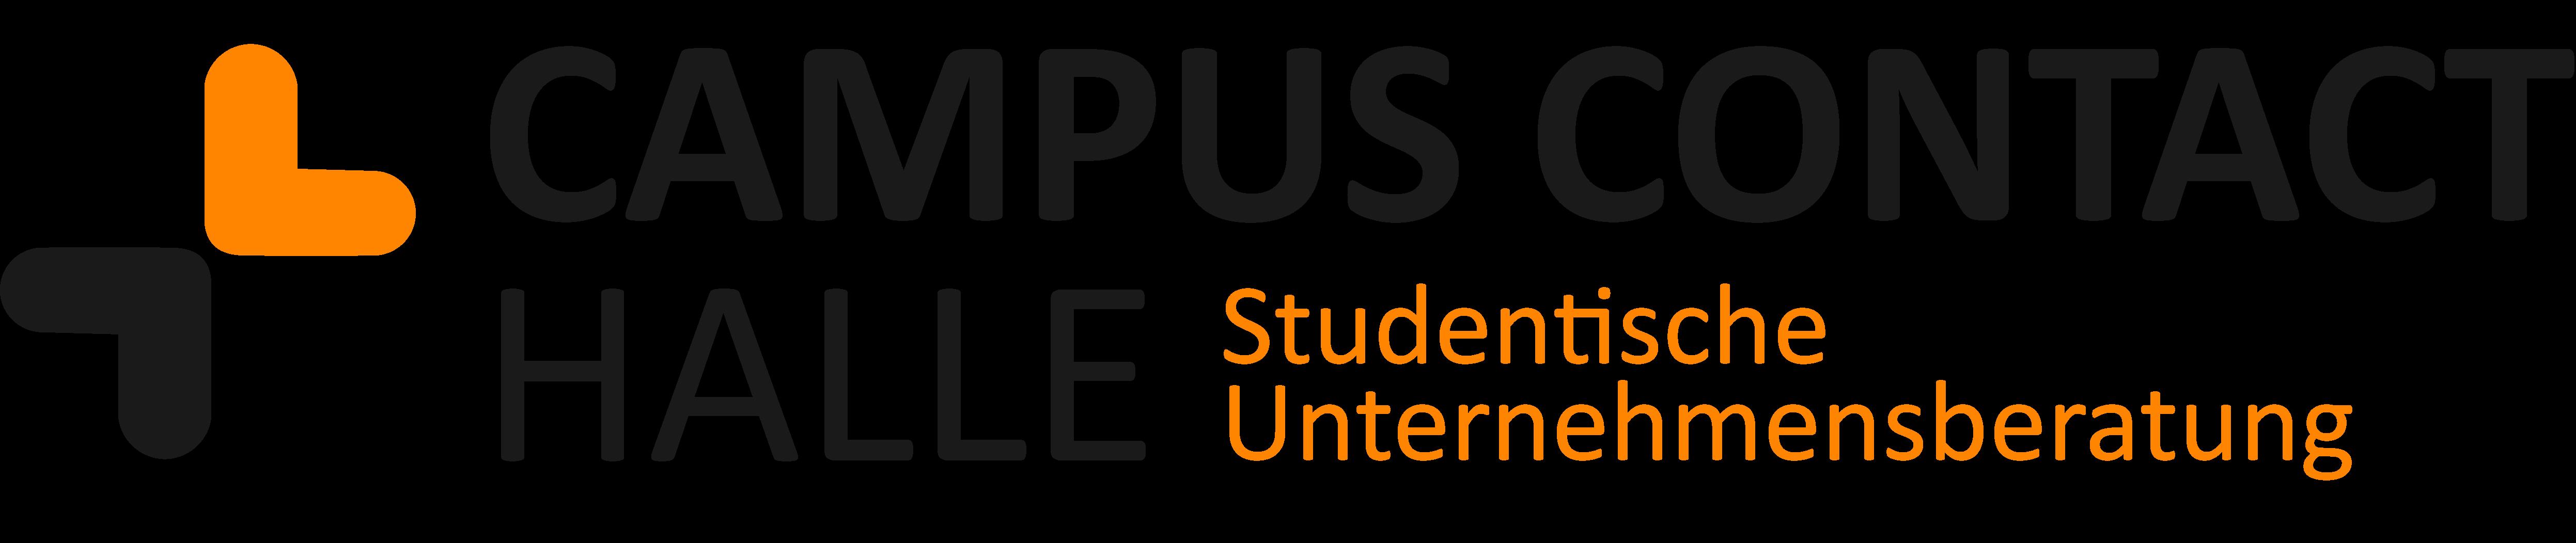 Campus Contact